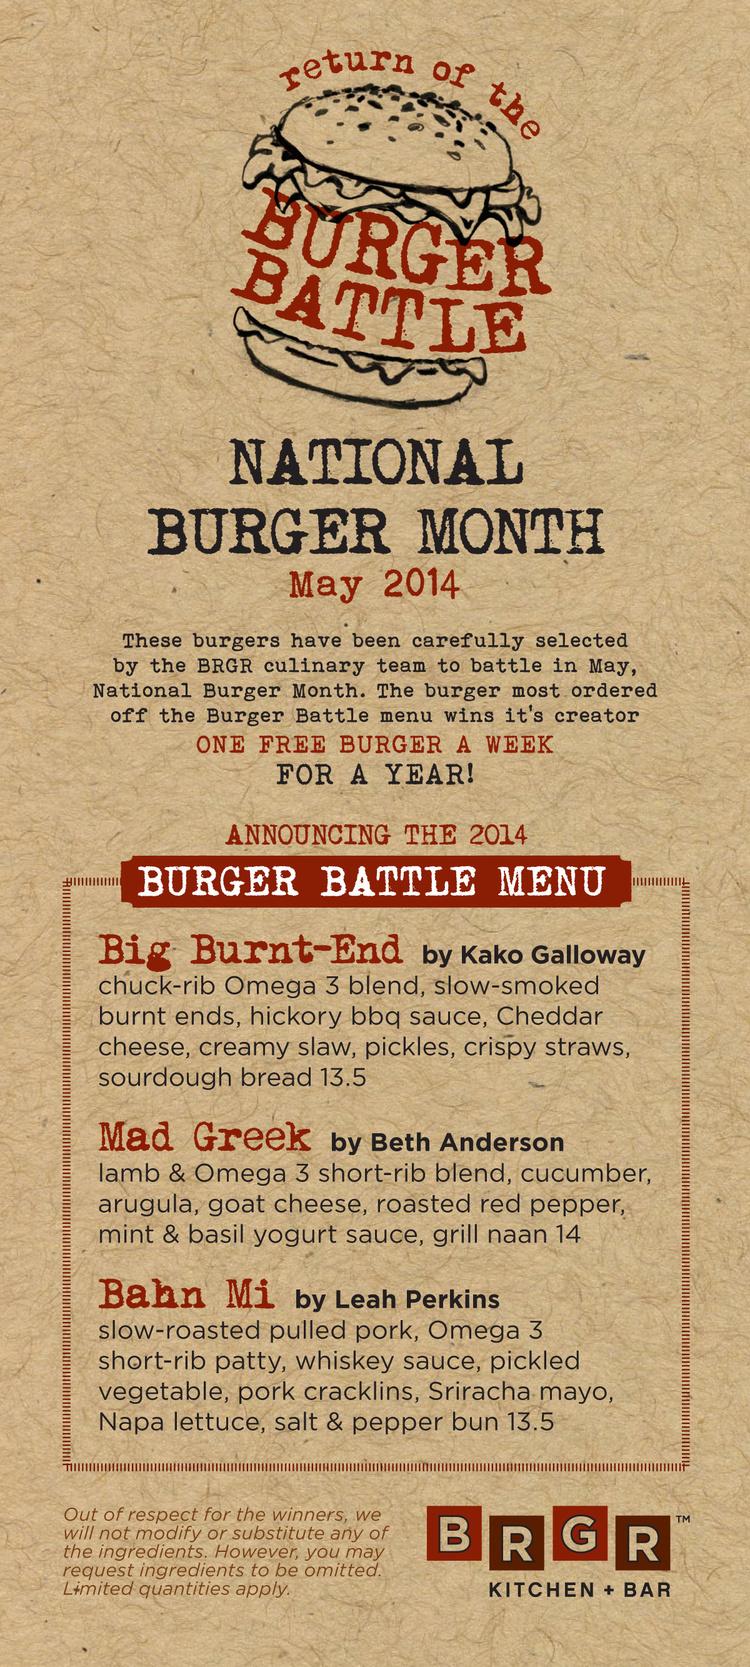 brgr_burgerbattle_menu_2014.jpg